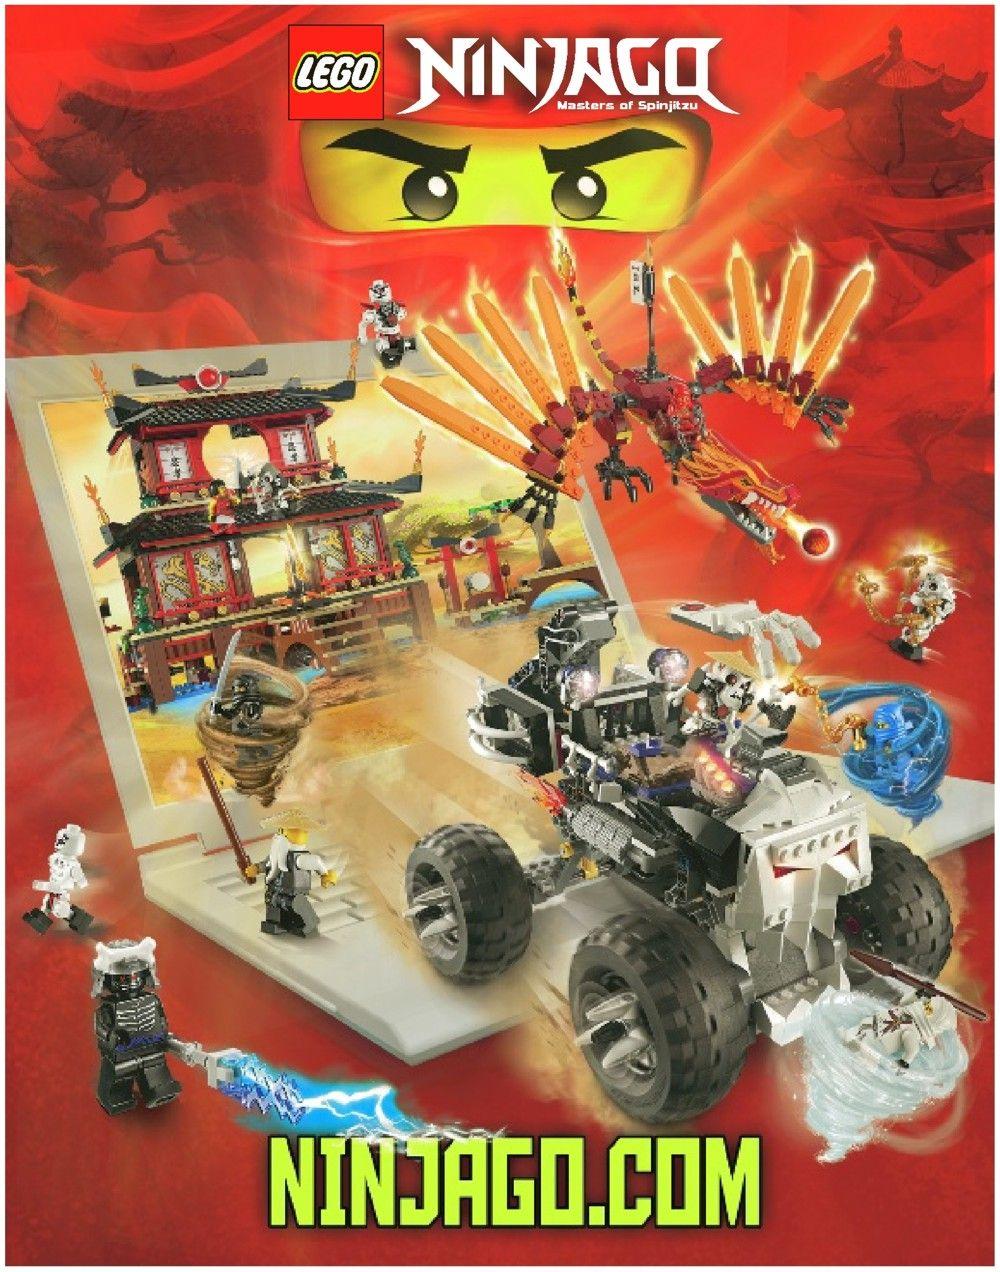 Ninjago Fire Temple Lego 2507 Lego Pinterest Lego Lego